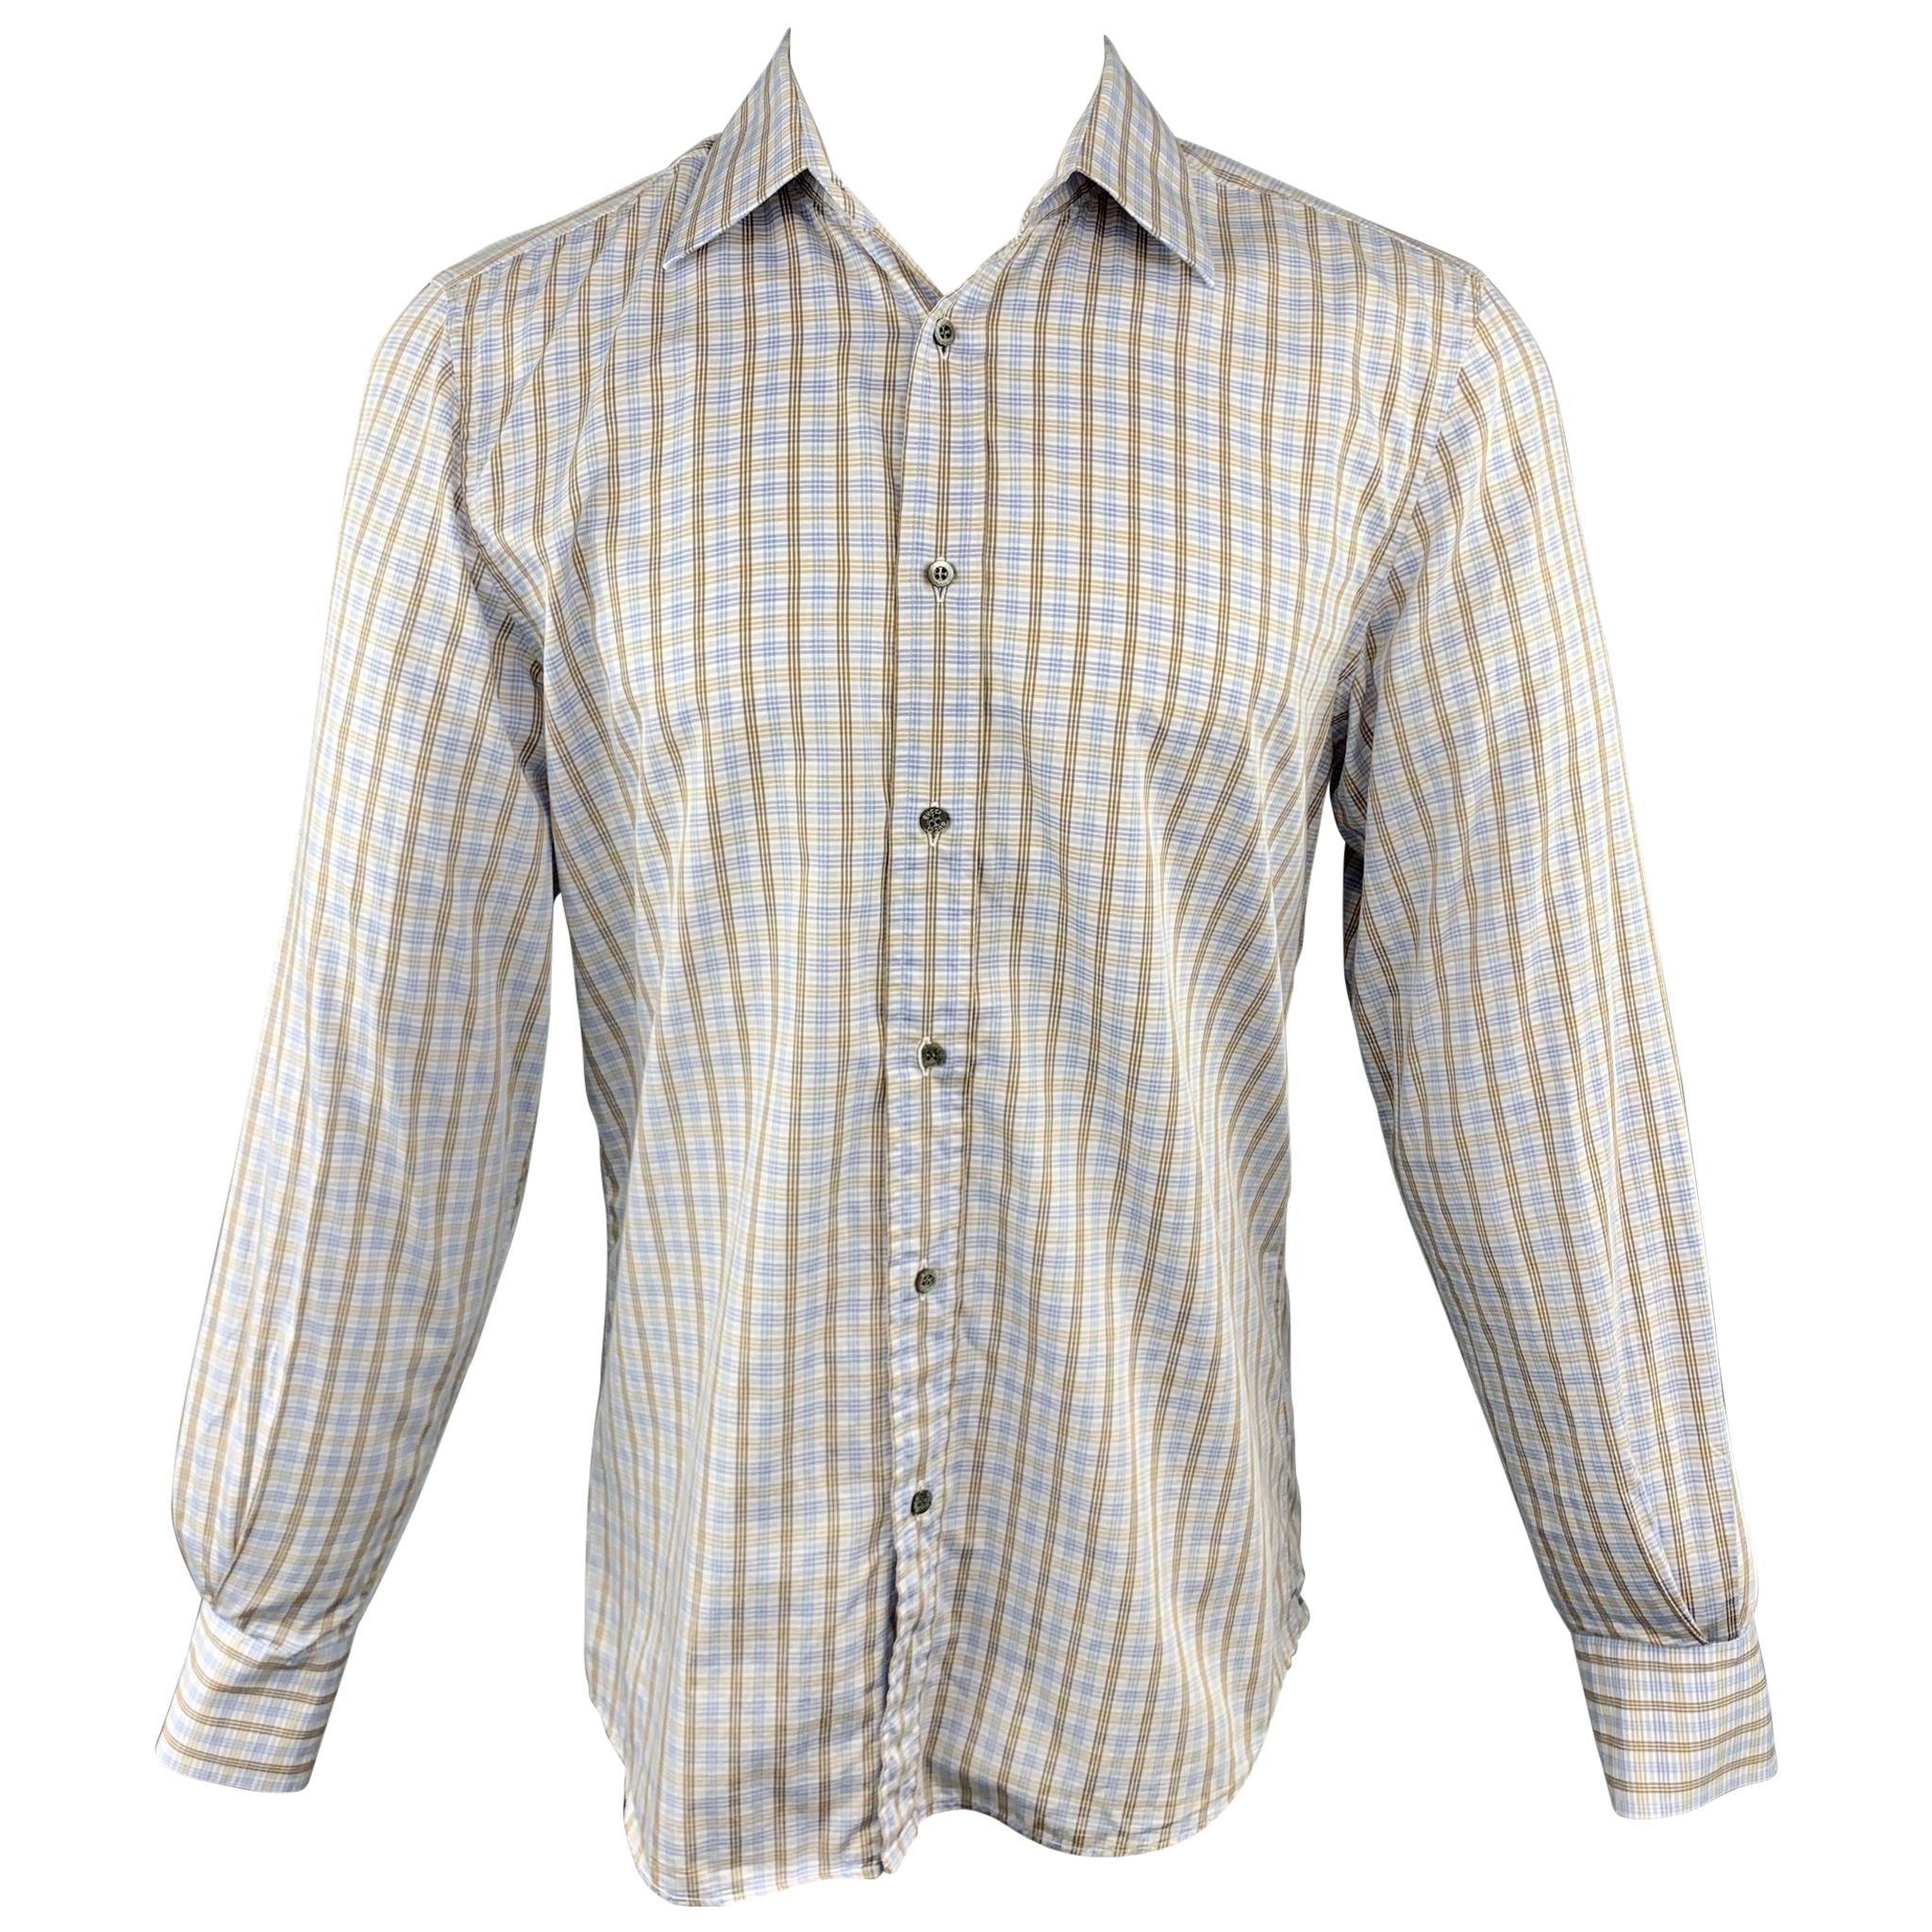 GUCCI Size M Blue & Brown Plaid Cotton Button Up Long Sleeve Shirt